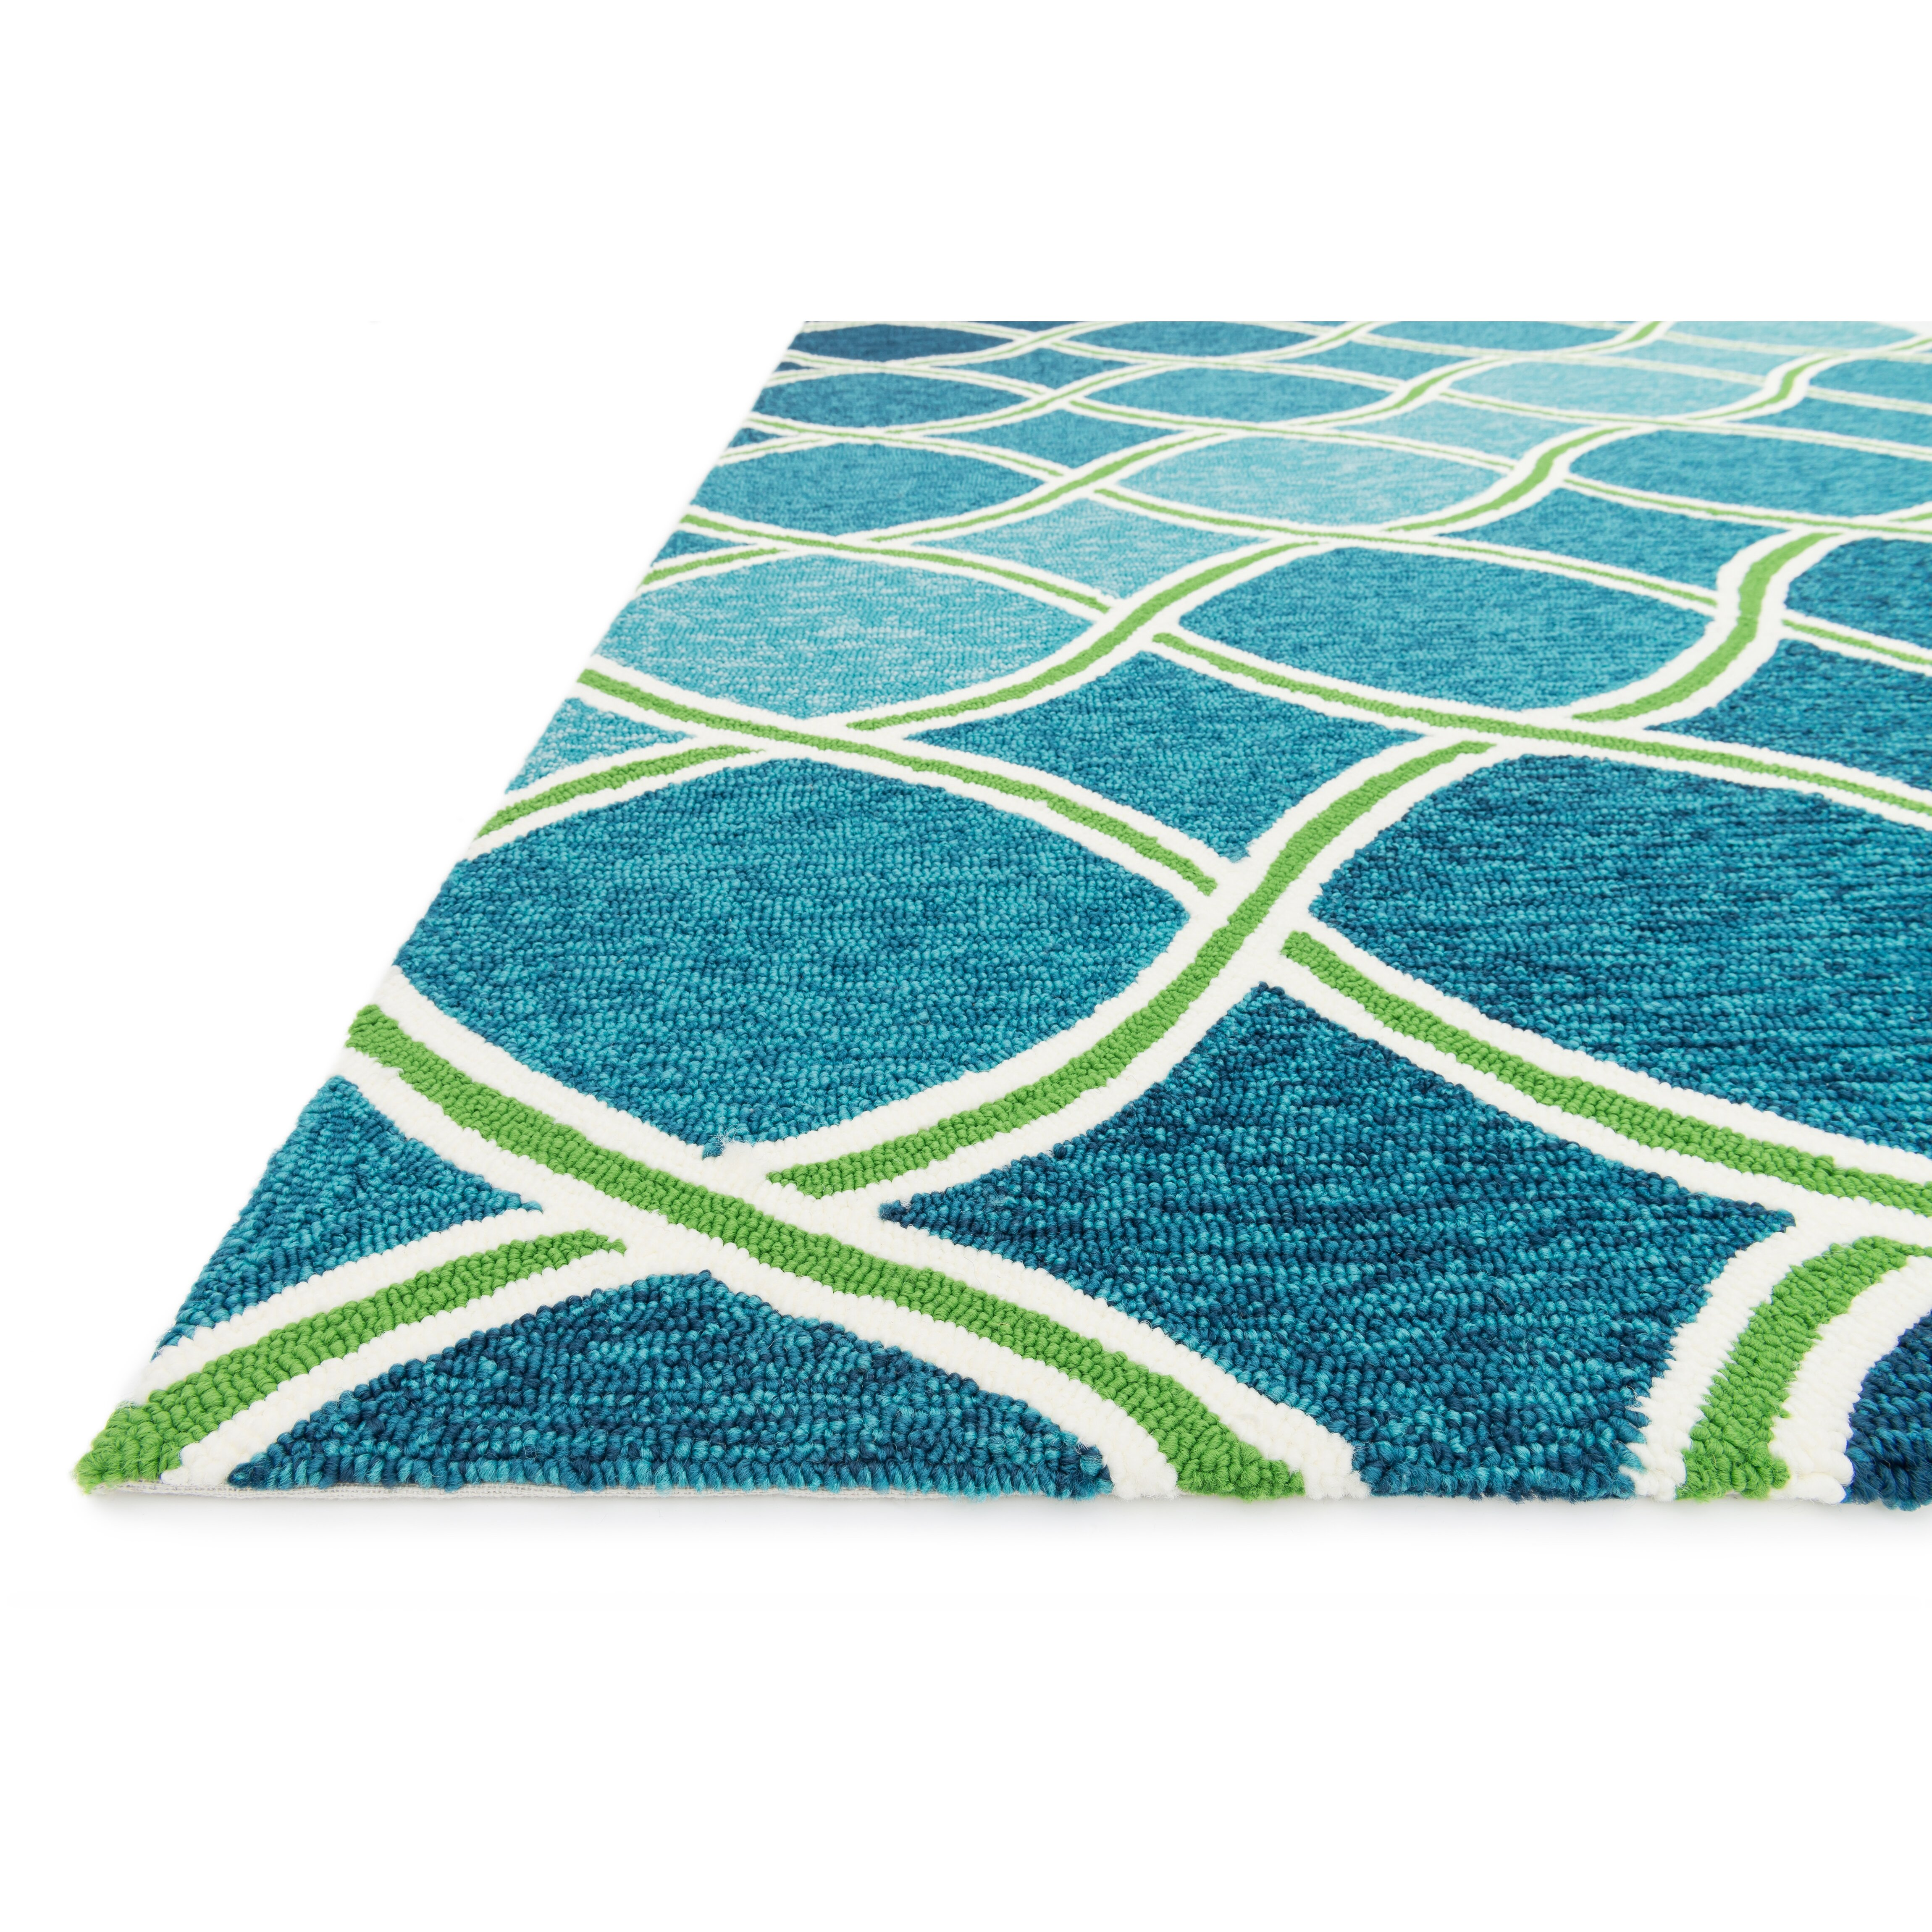 Loloi Rugs Venice Beach Blue/Green Indoor/Outdoor Area Rug